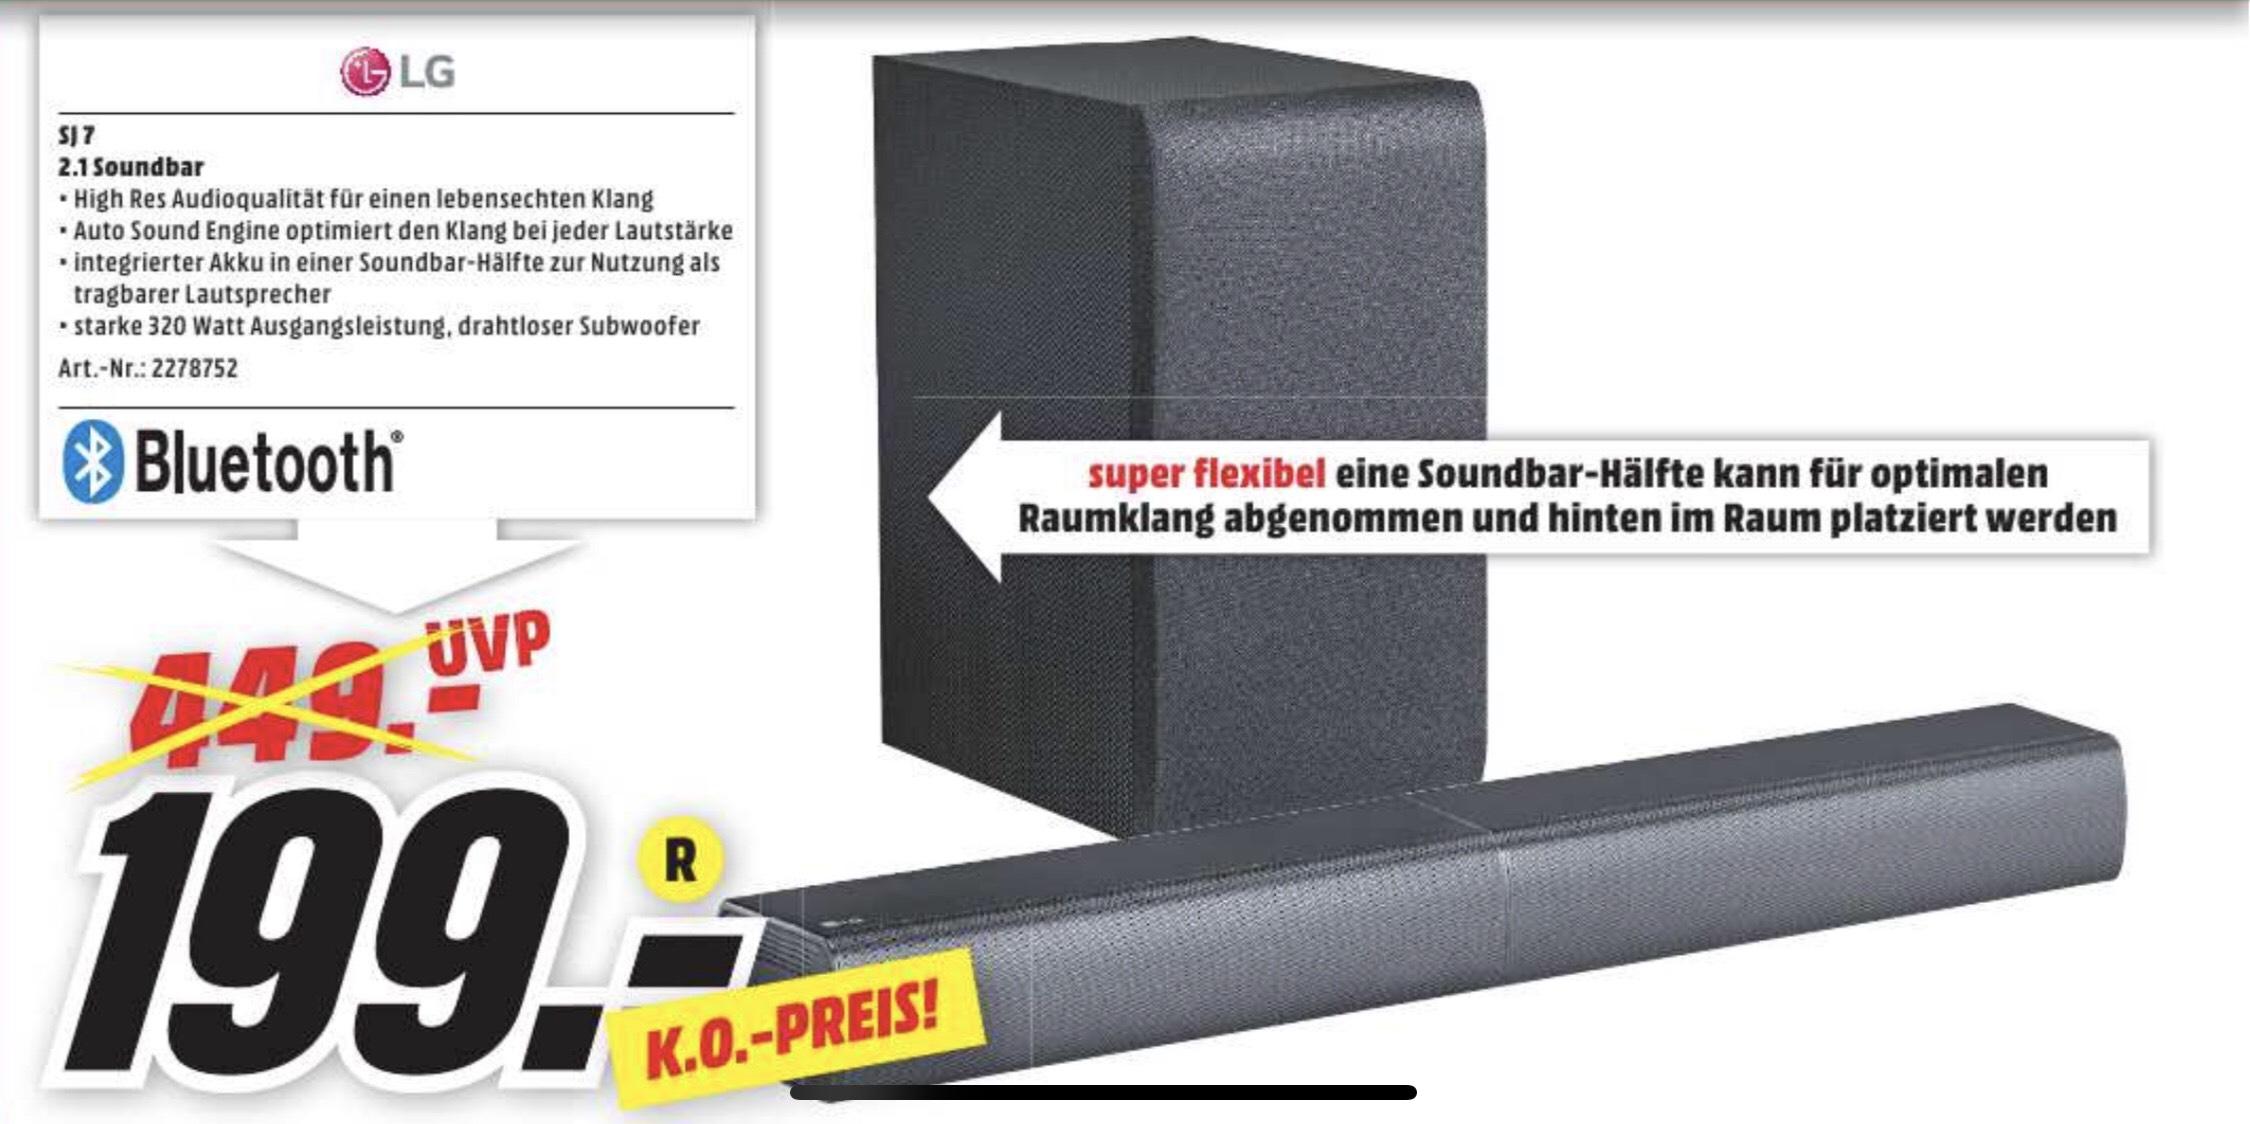 [Regional Mediamarkt Heilbronn] LG sj7 2.1 Soundbar